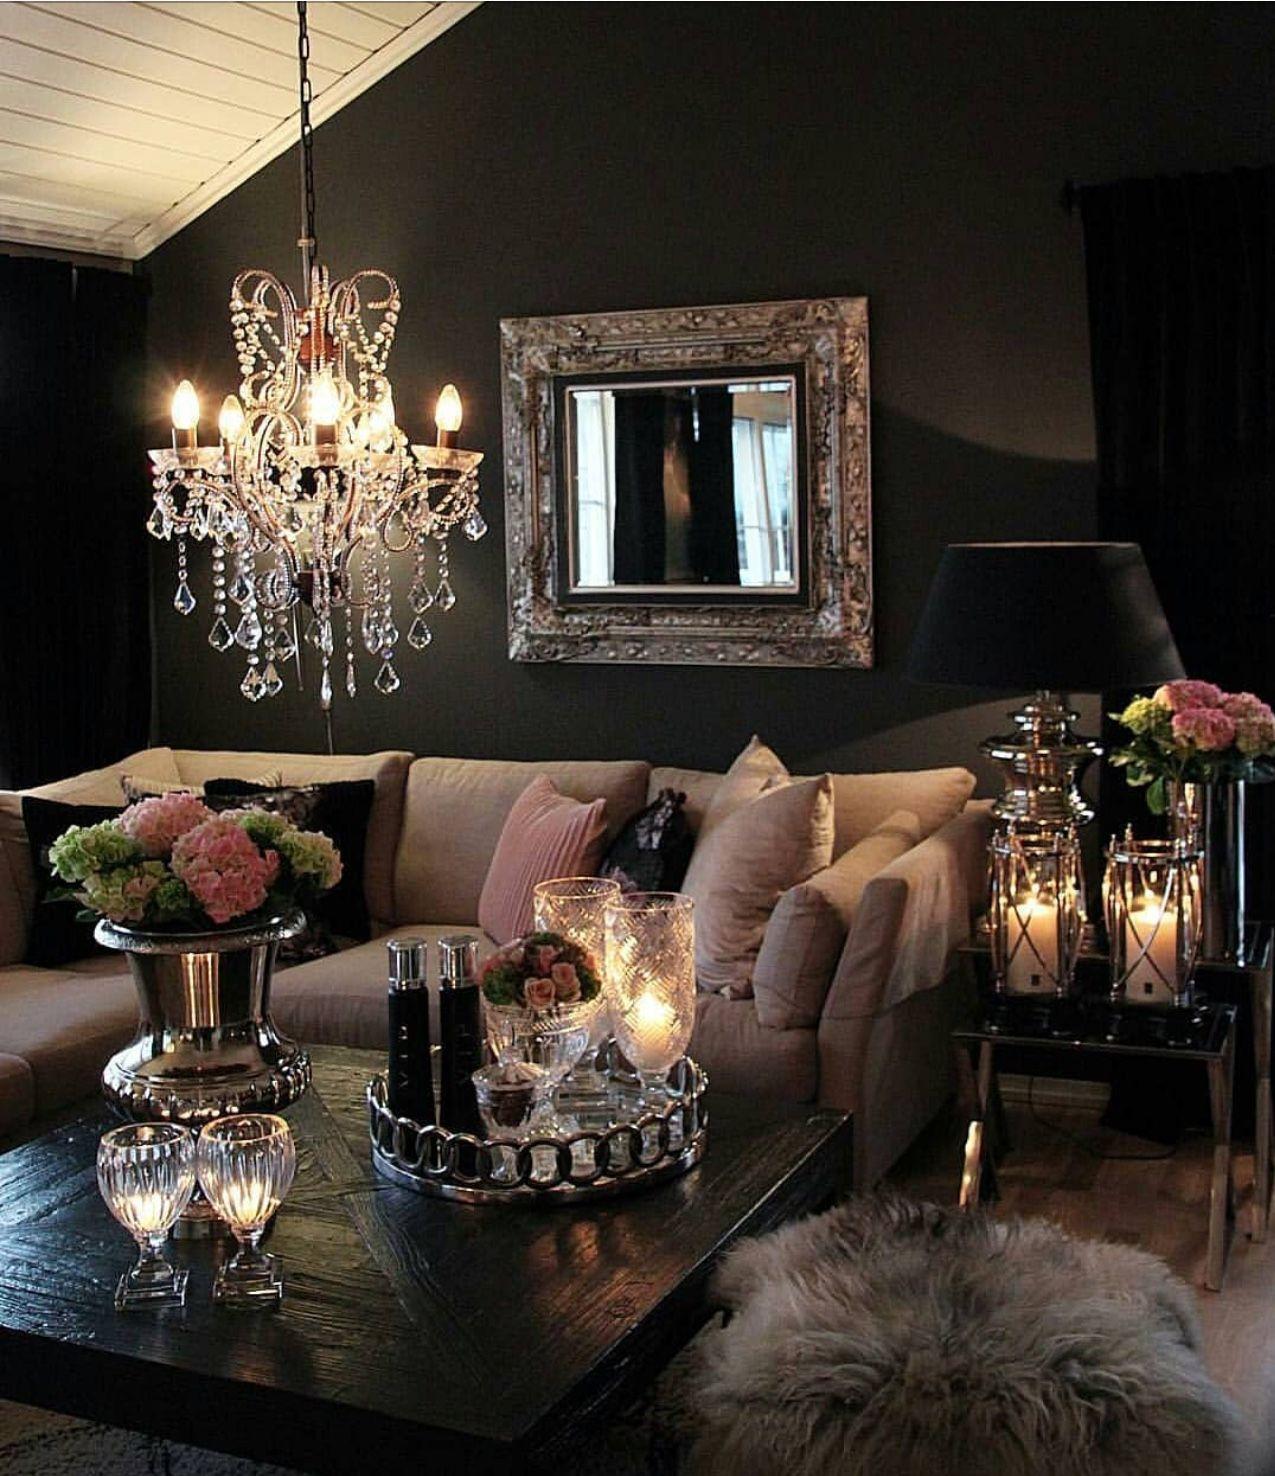 15 Amazing Ideas To Decorate Your Bedroom: 15+ Amazing Lux Bedroom Design Ideas